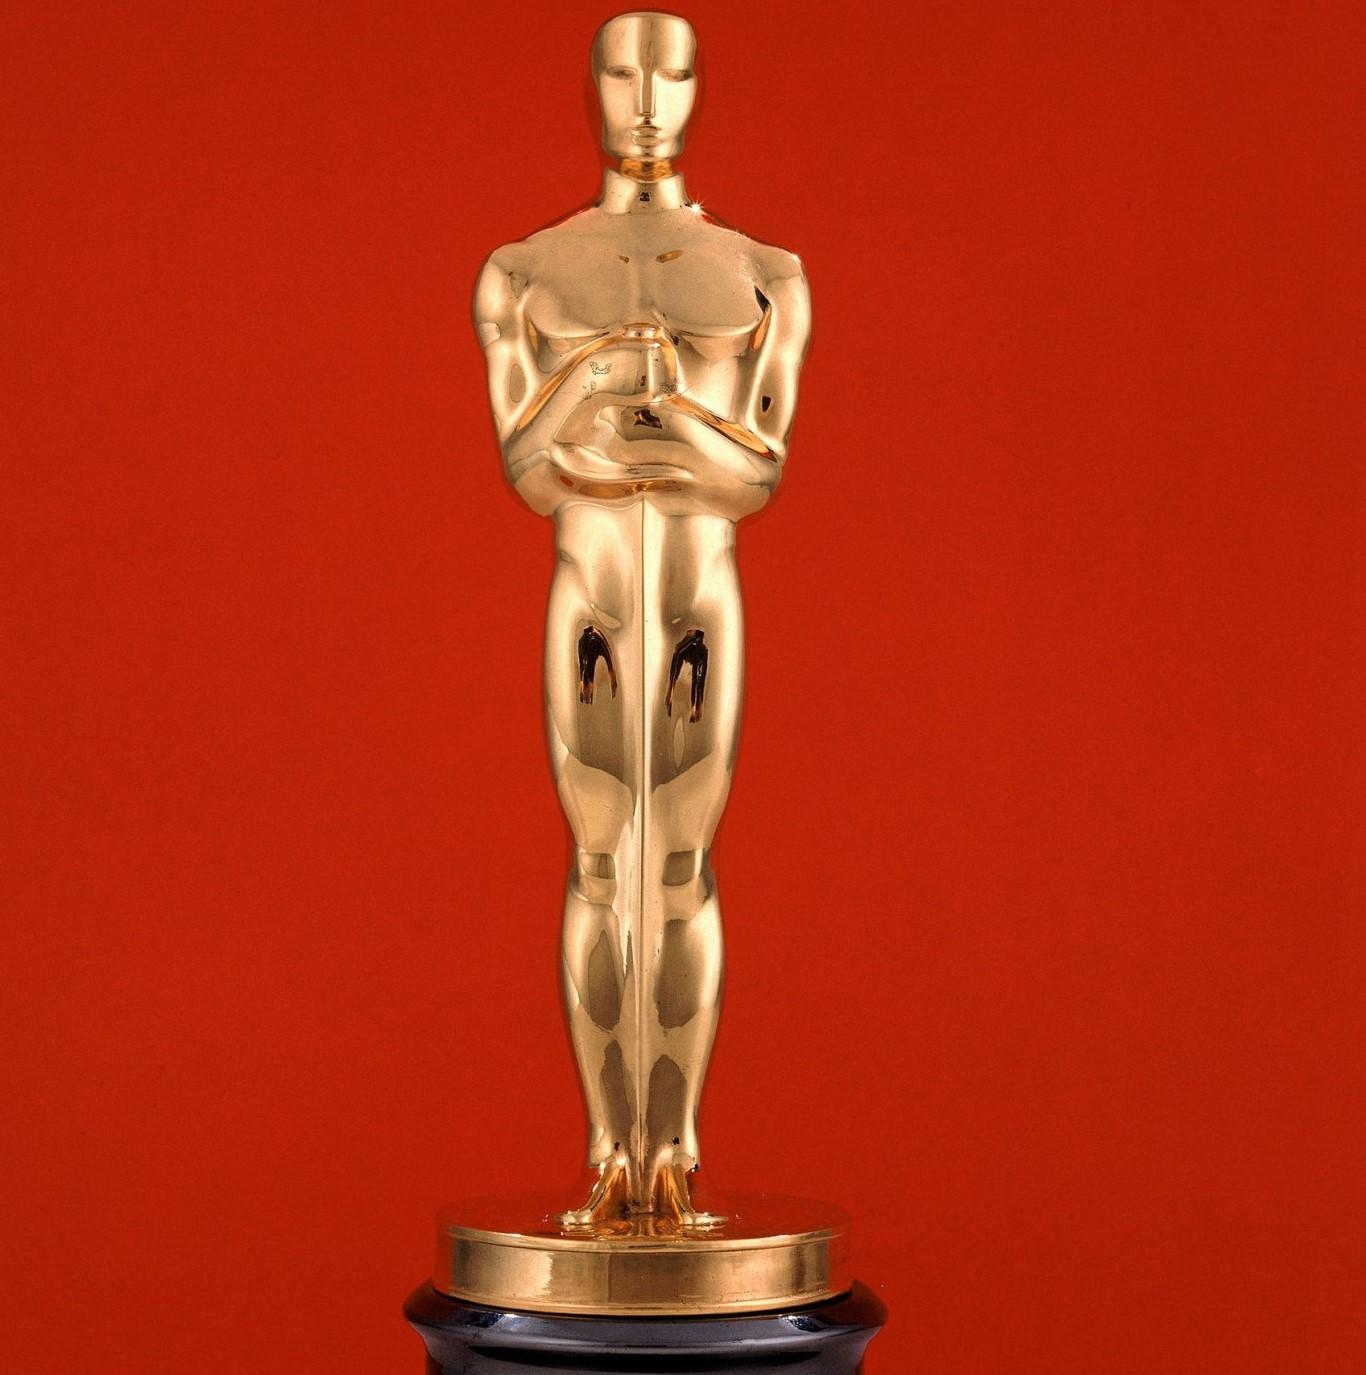 oscars-trophy